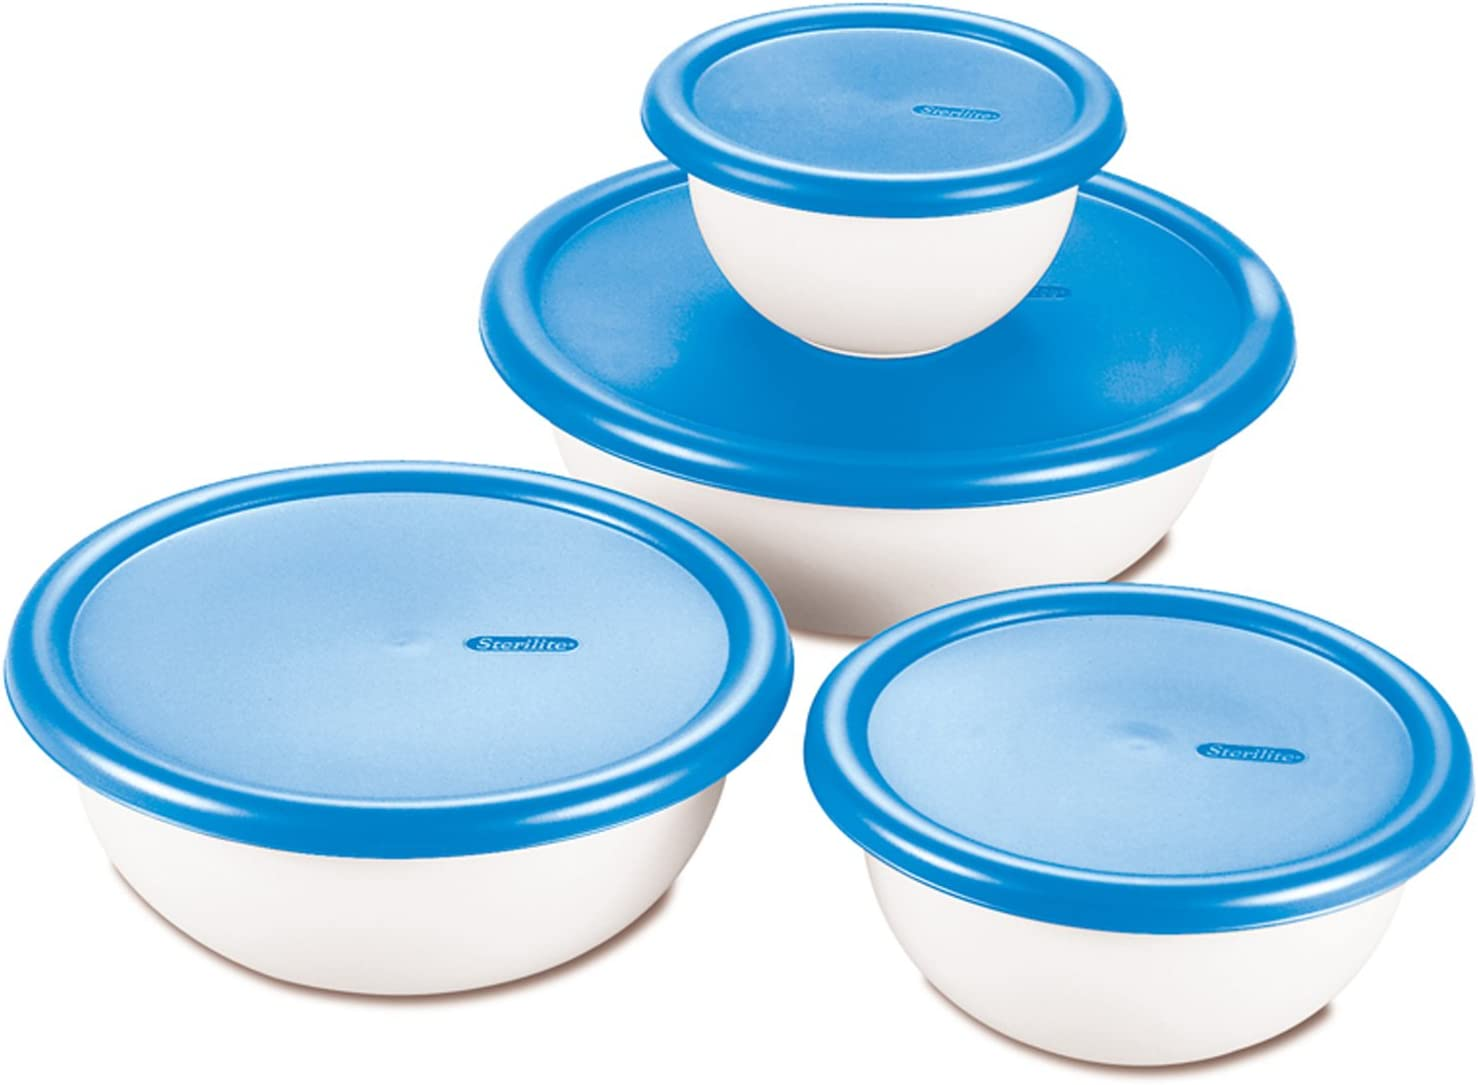 Sterilite 8 Piece Covered Set Bowl, Multisize, White & Blue: Kitchen & Dining